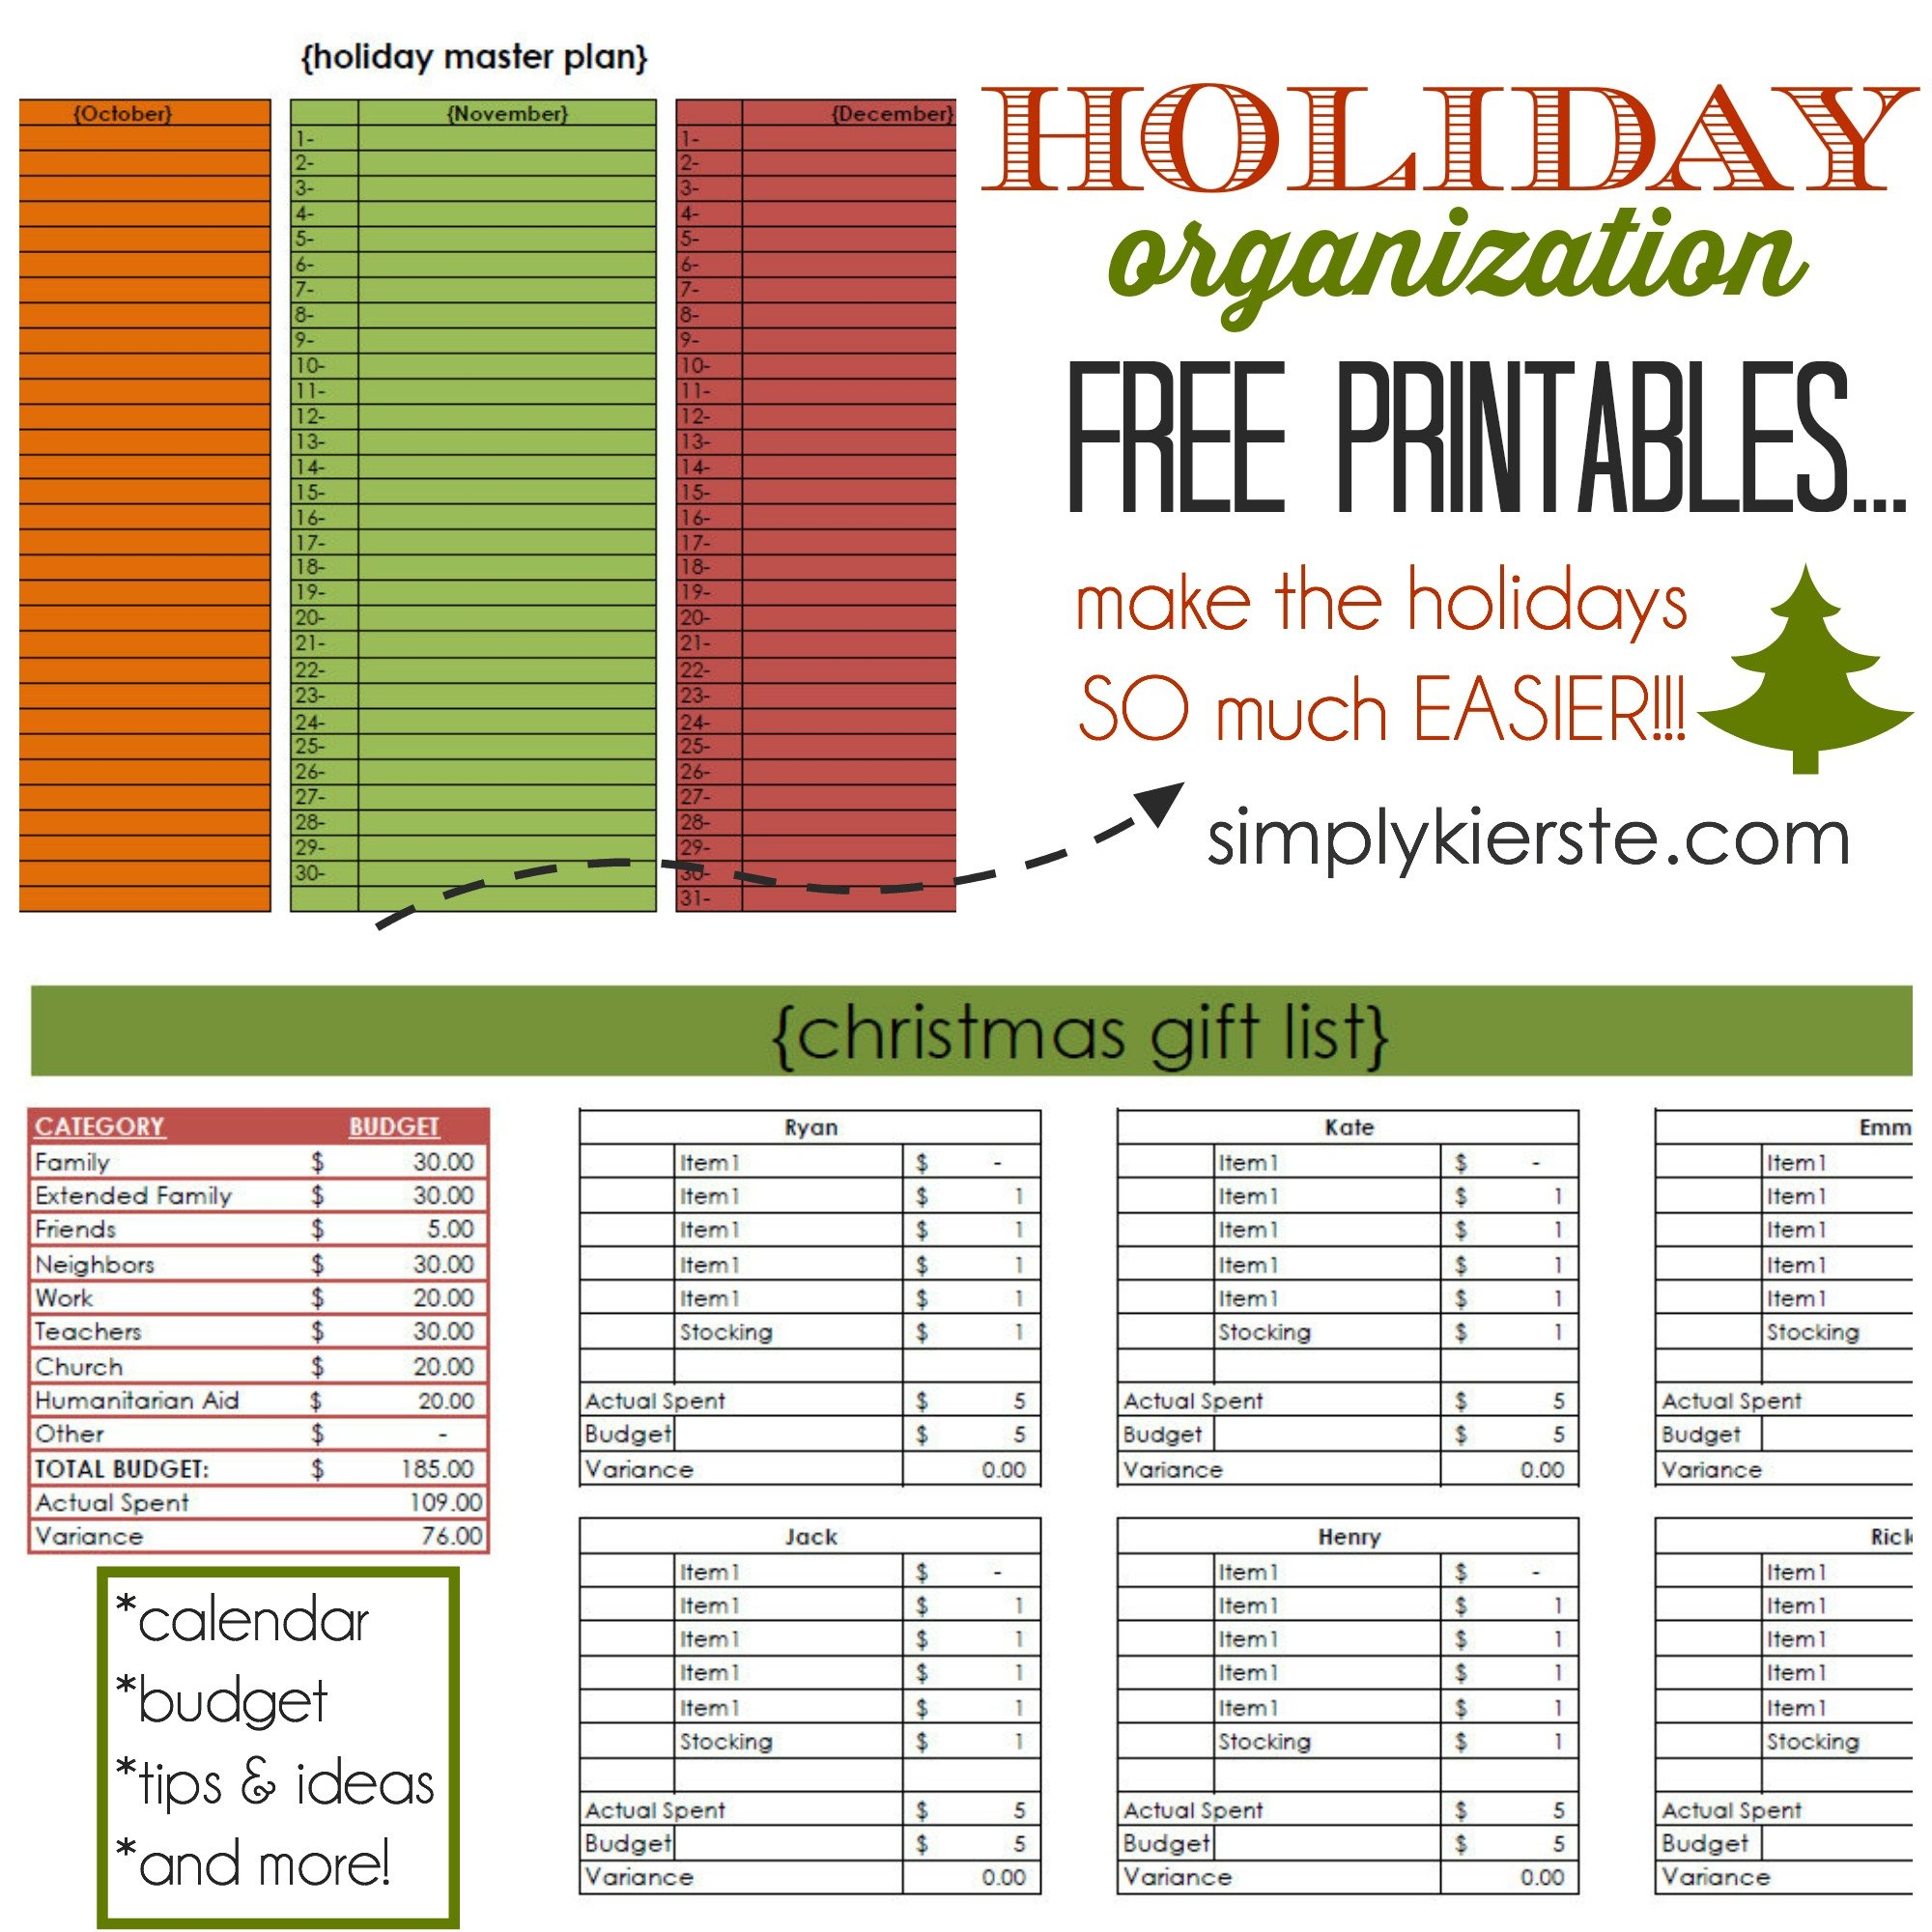 Holiday Organization Free Printables | simplykierste.com